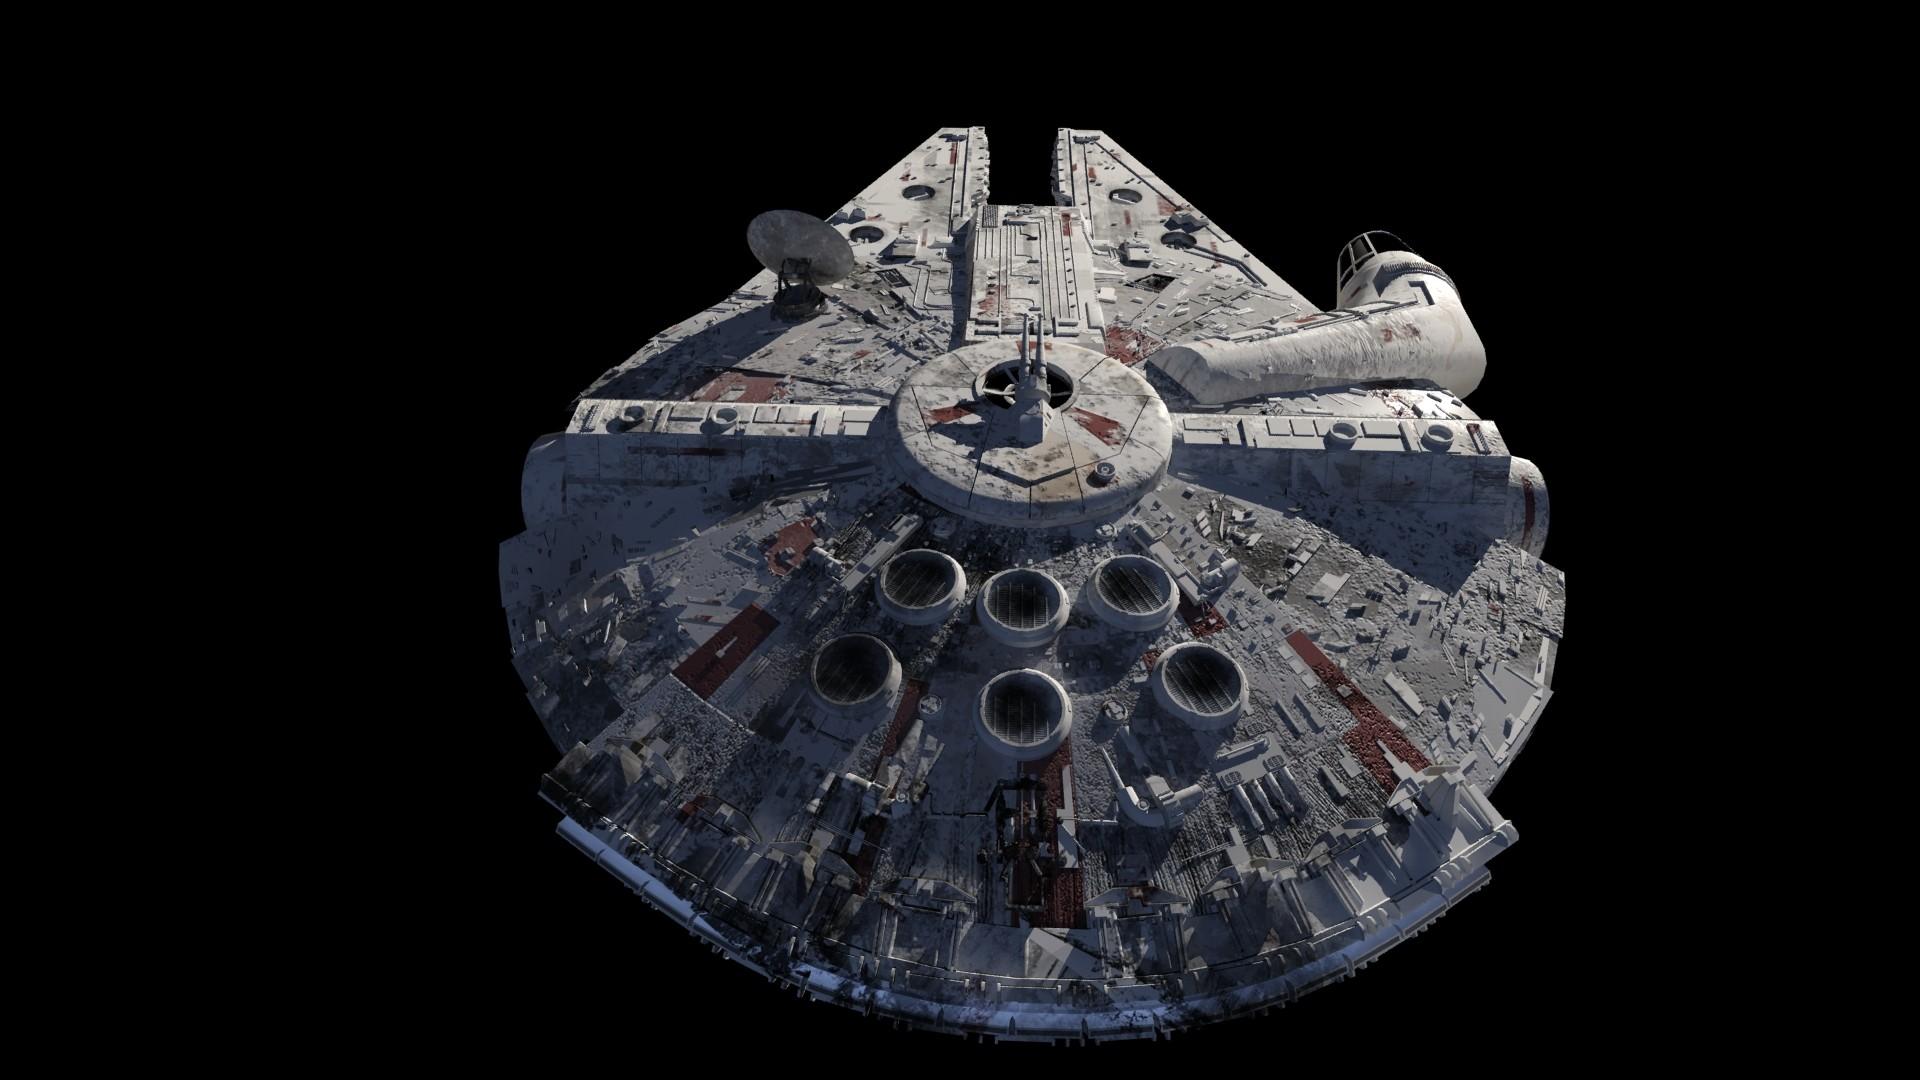 Millenium Falcon Back 3D by Teonardo Millenium Falcon Back 3D by Teonardo